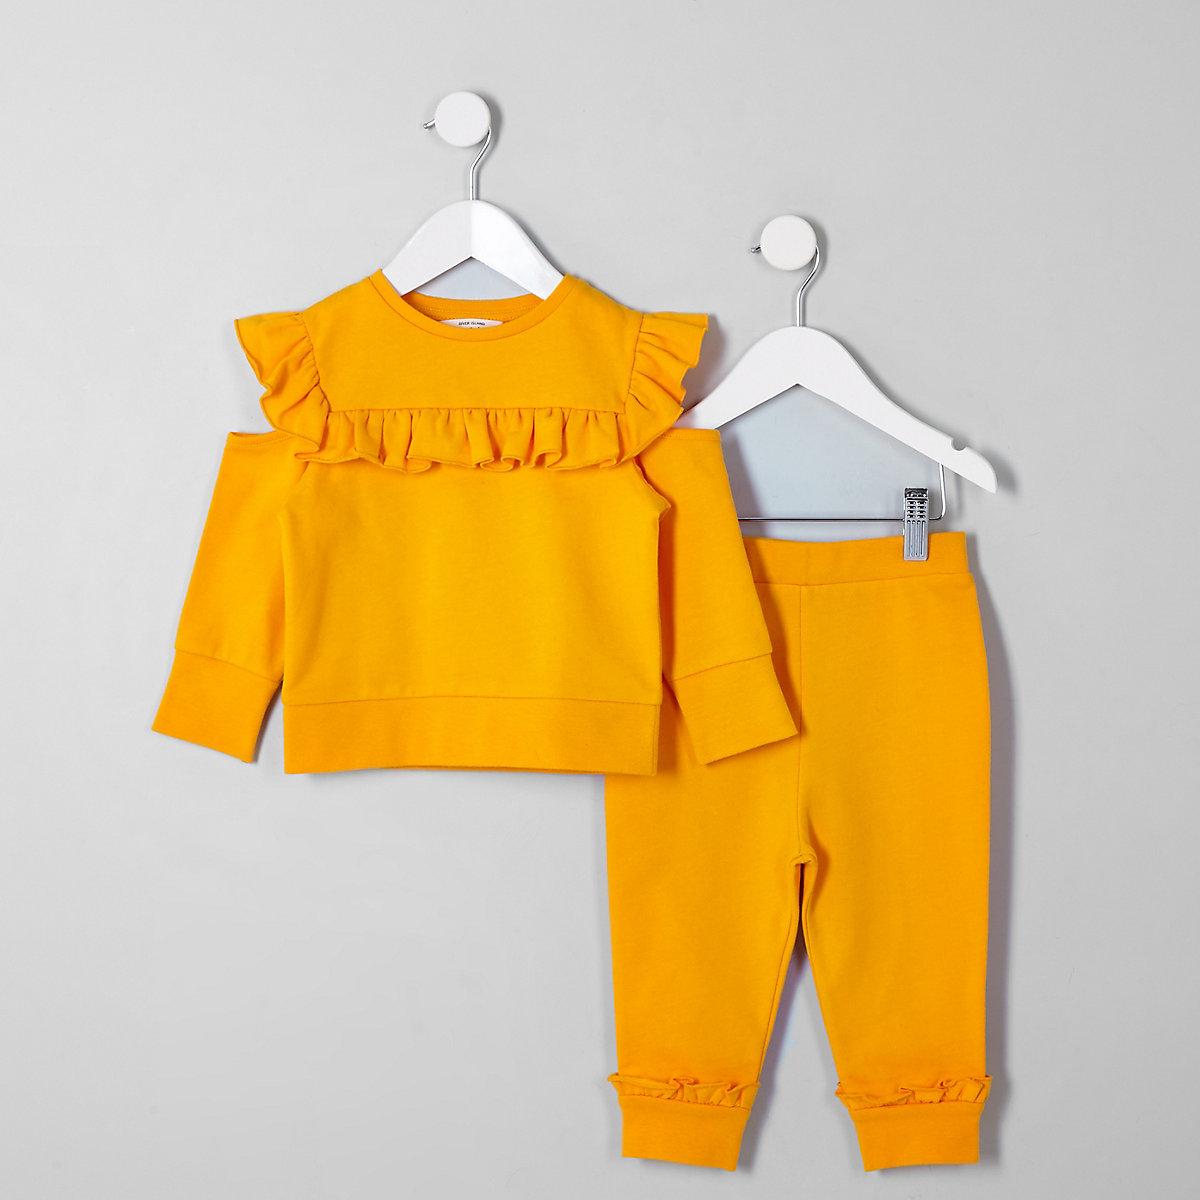 Mini girls yellow sweatshirt outfit